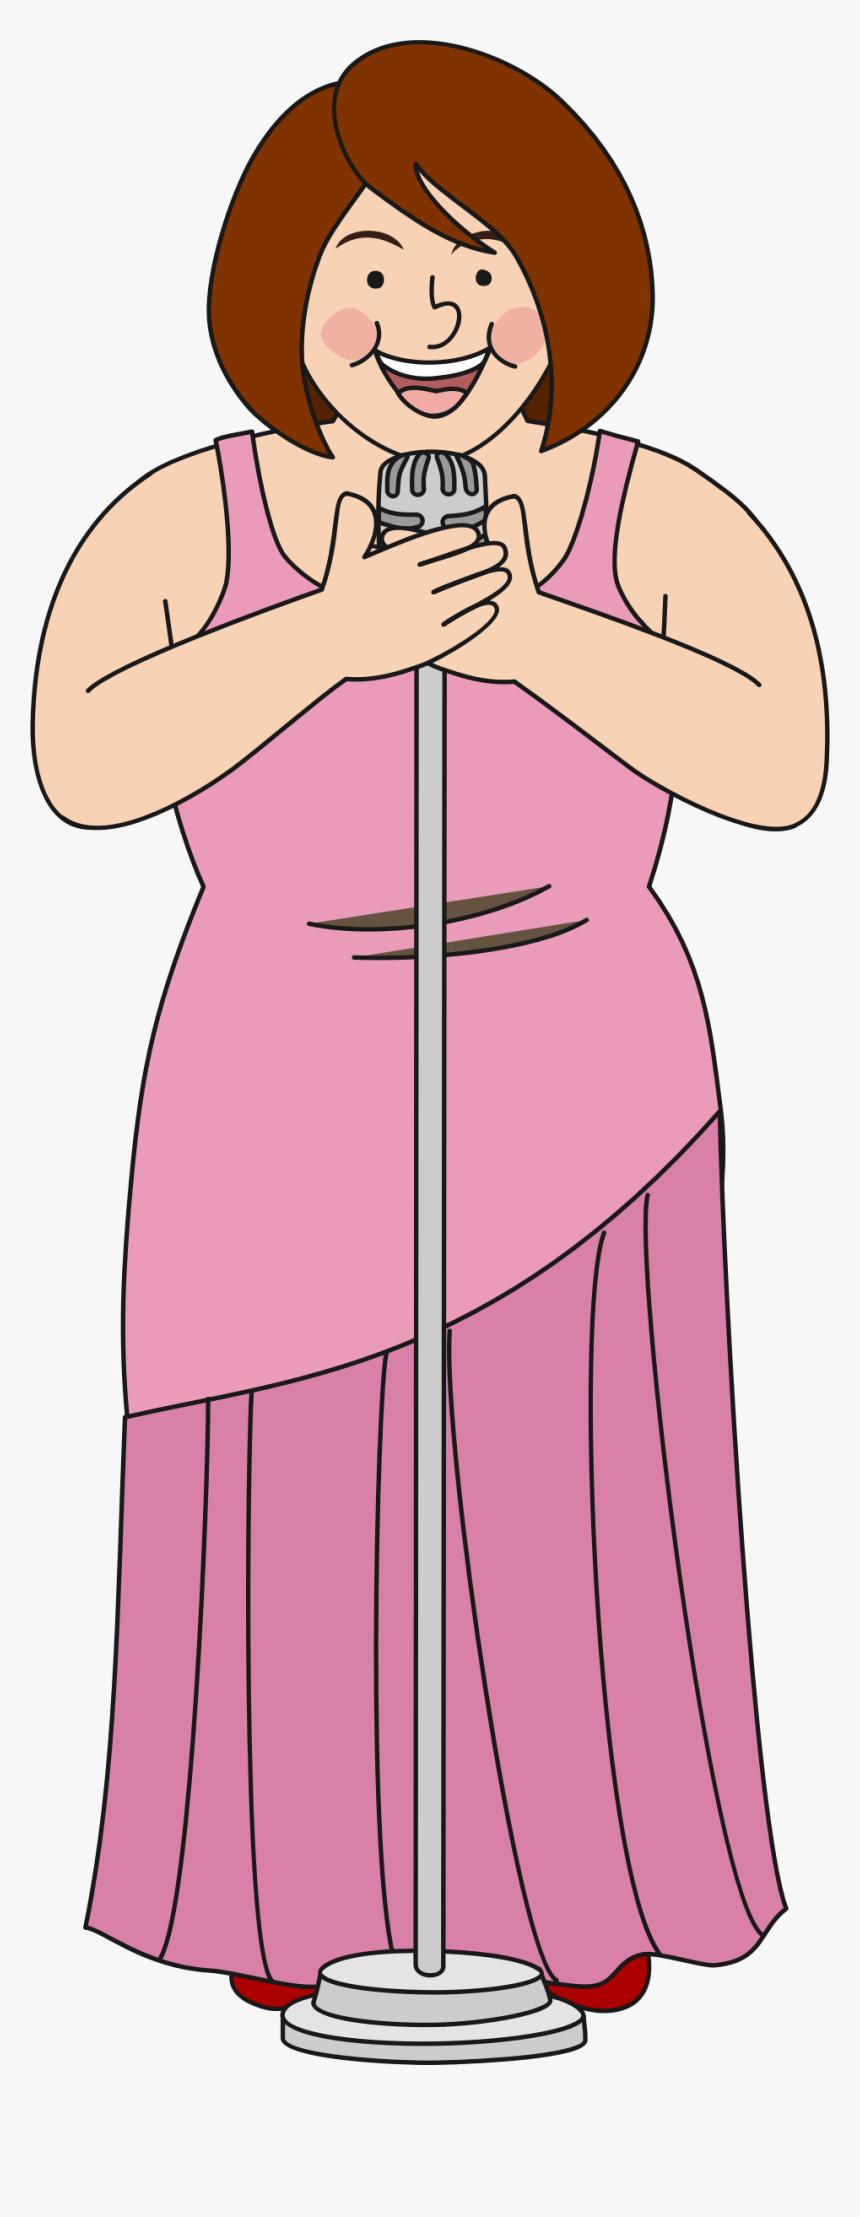 Singer Clipart Woman Singer - Illustration, HD Png Download, Free Download